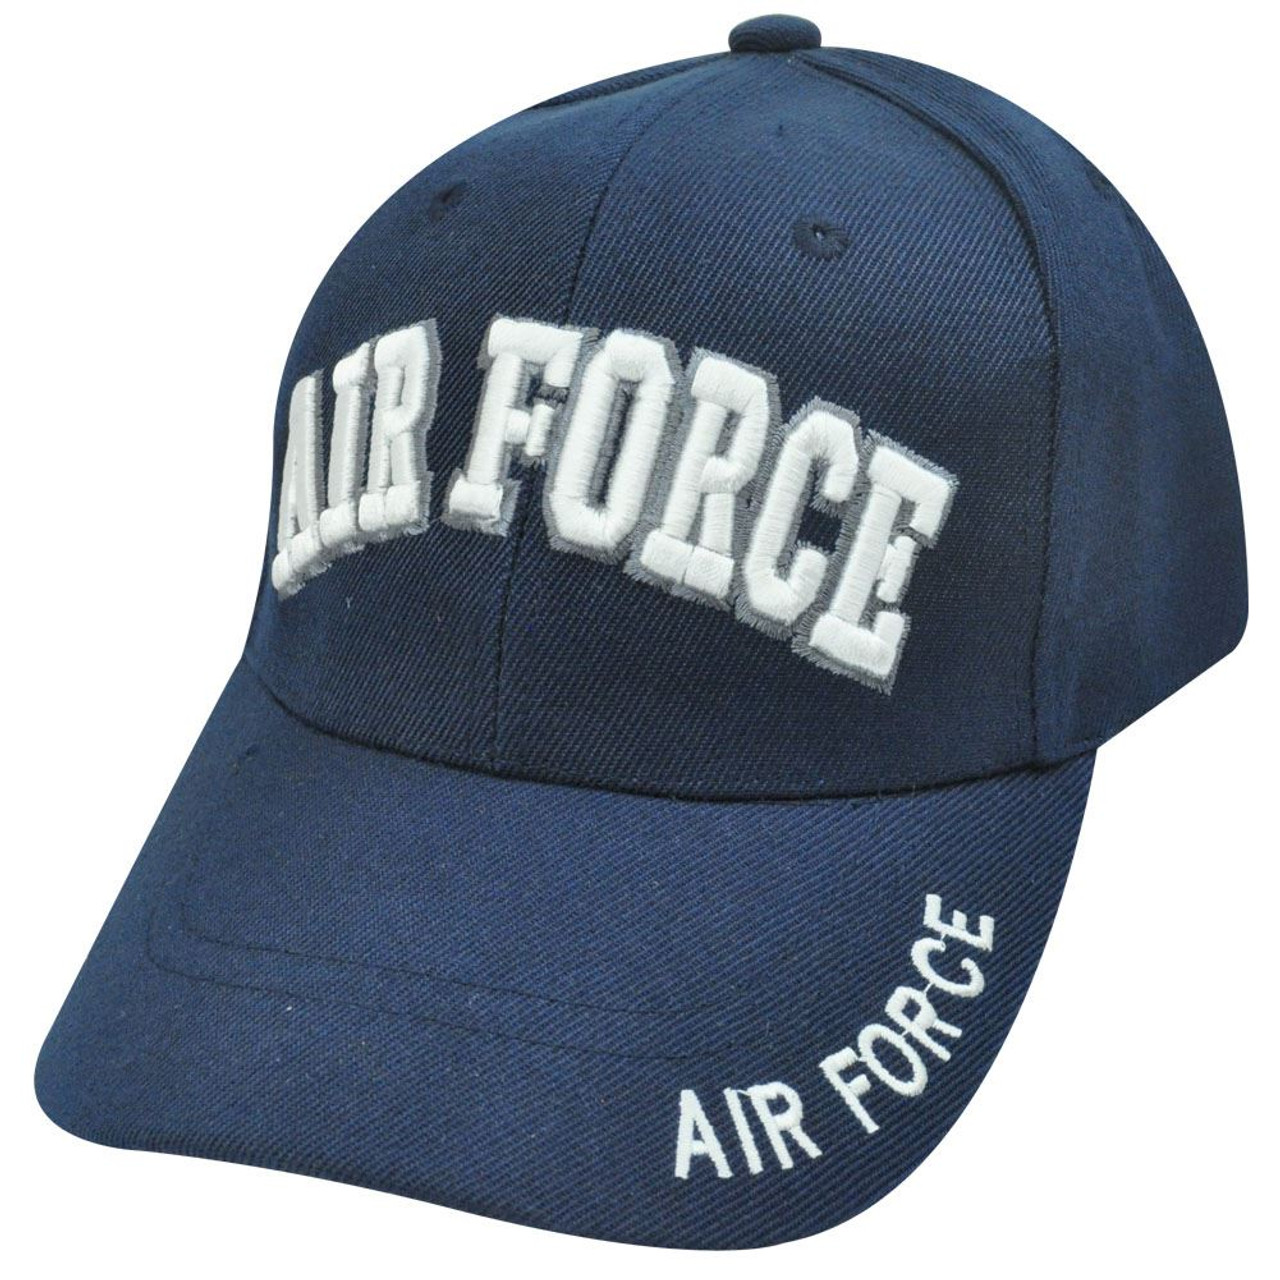 56d5e28d4 US USA AIR FORCE NAVY BLUE VELCRO ADJUSTABLE HAT CAP